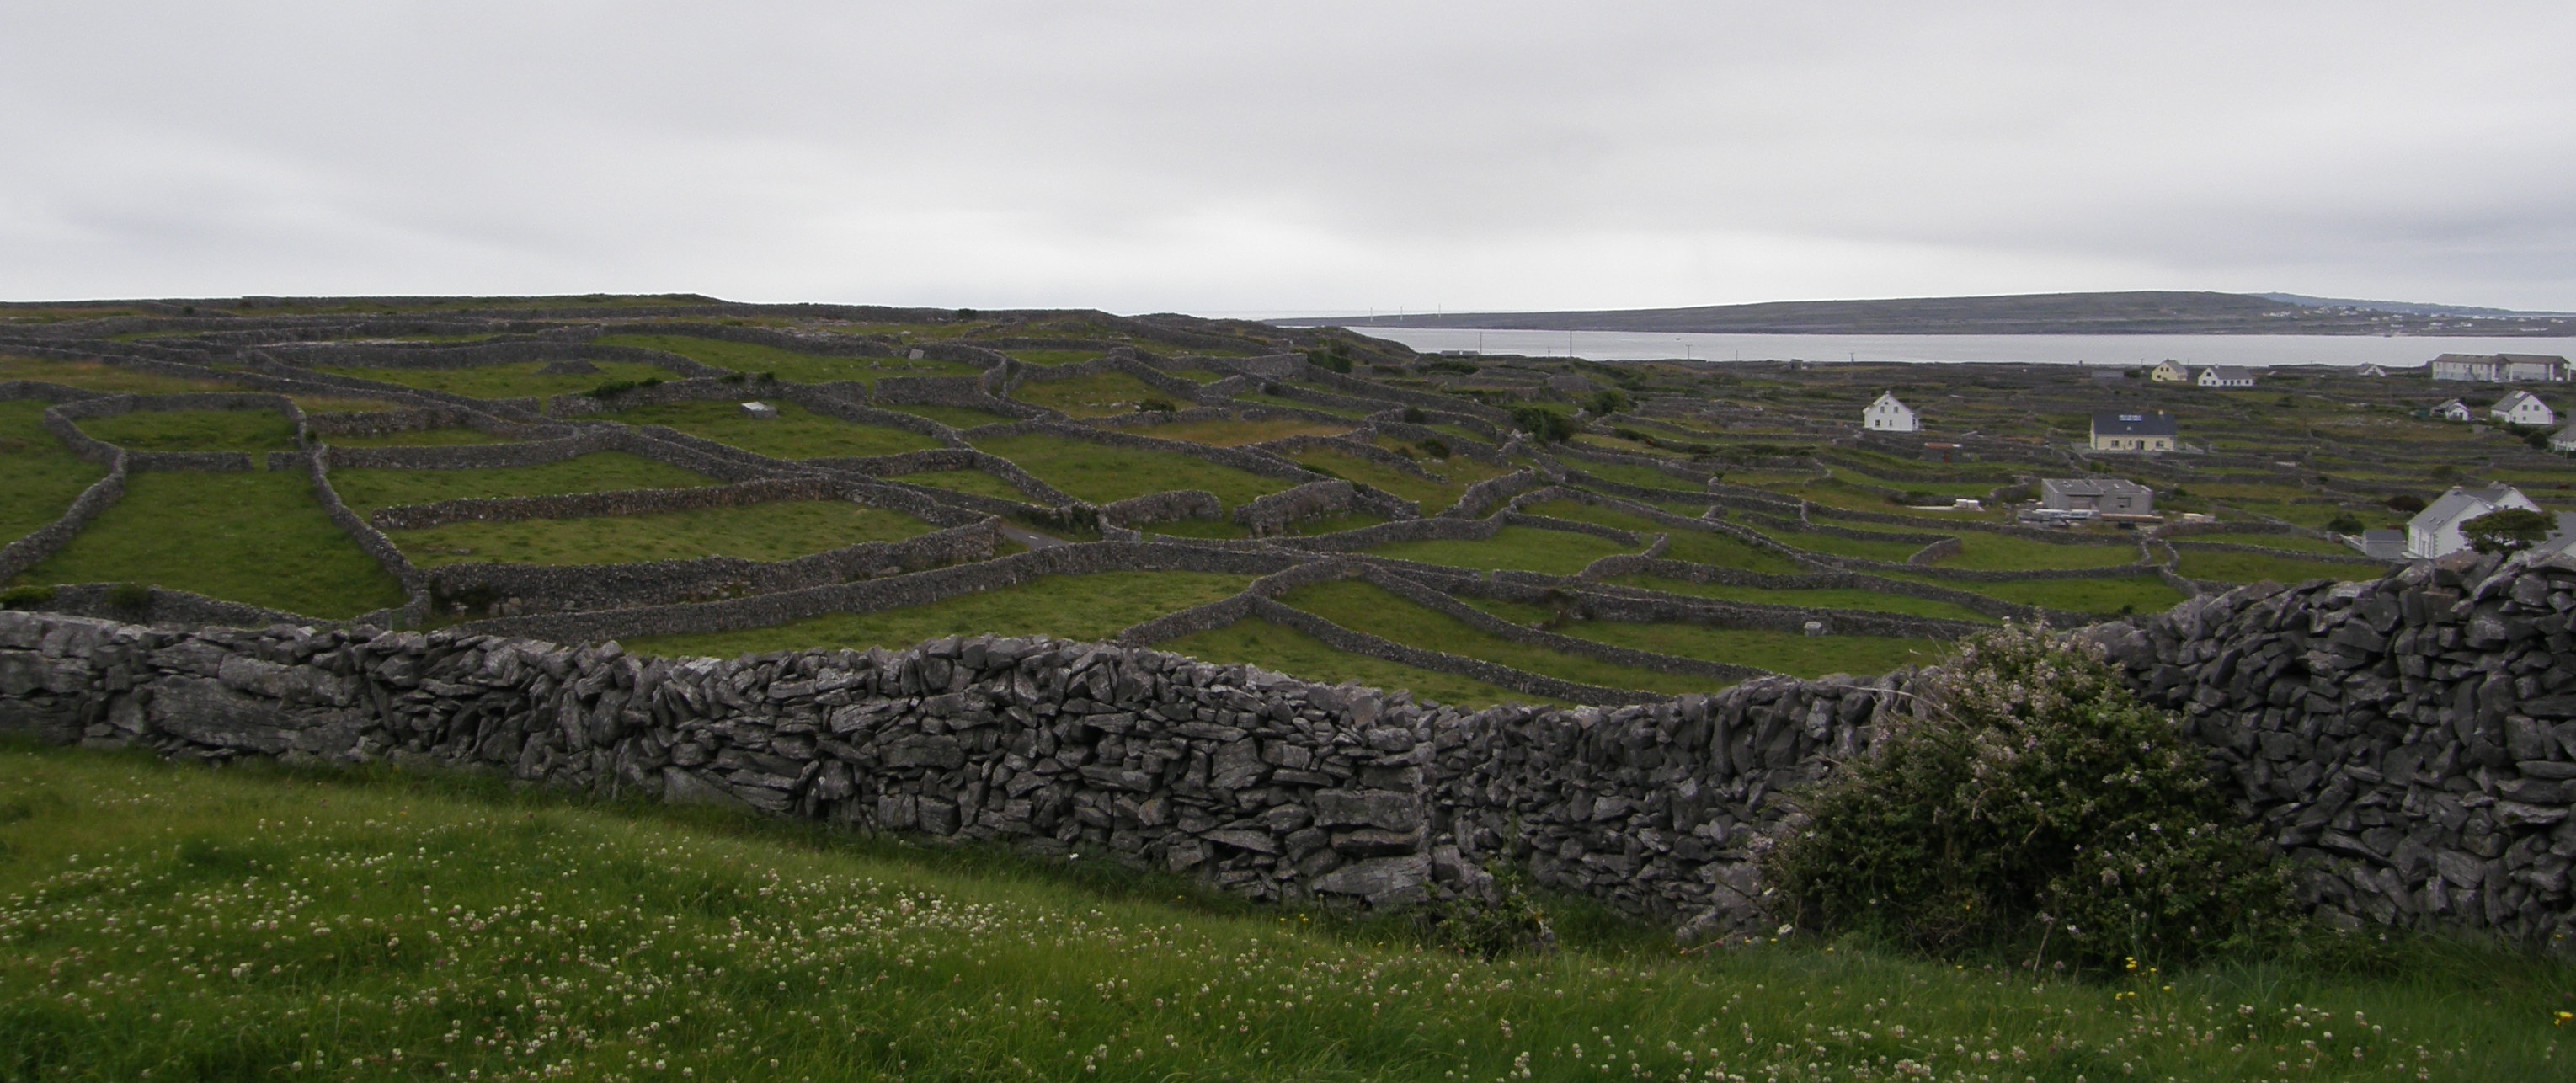 Rock-walled Fields (Inis Oírr)